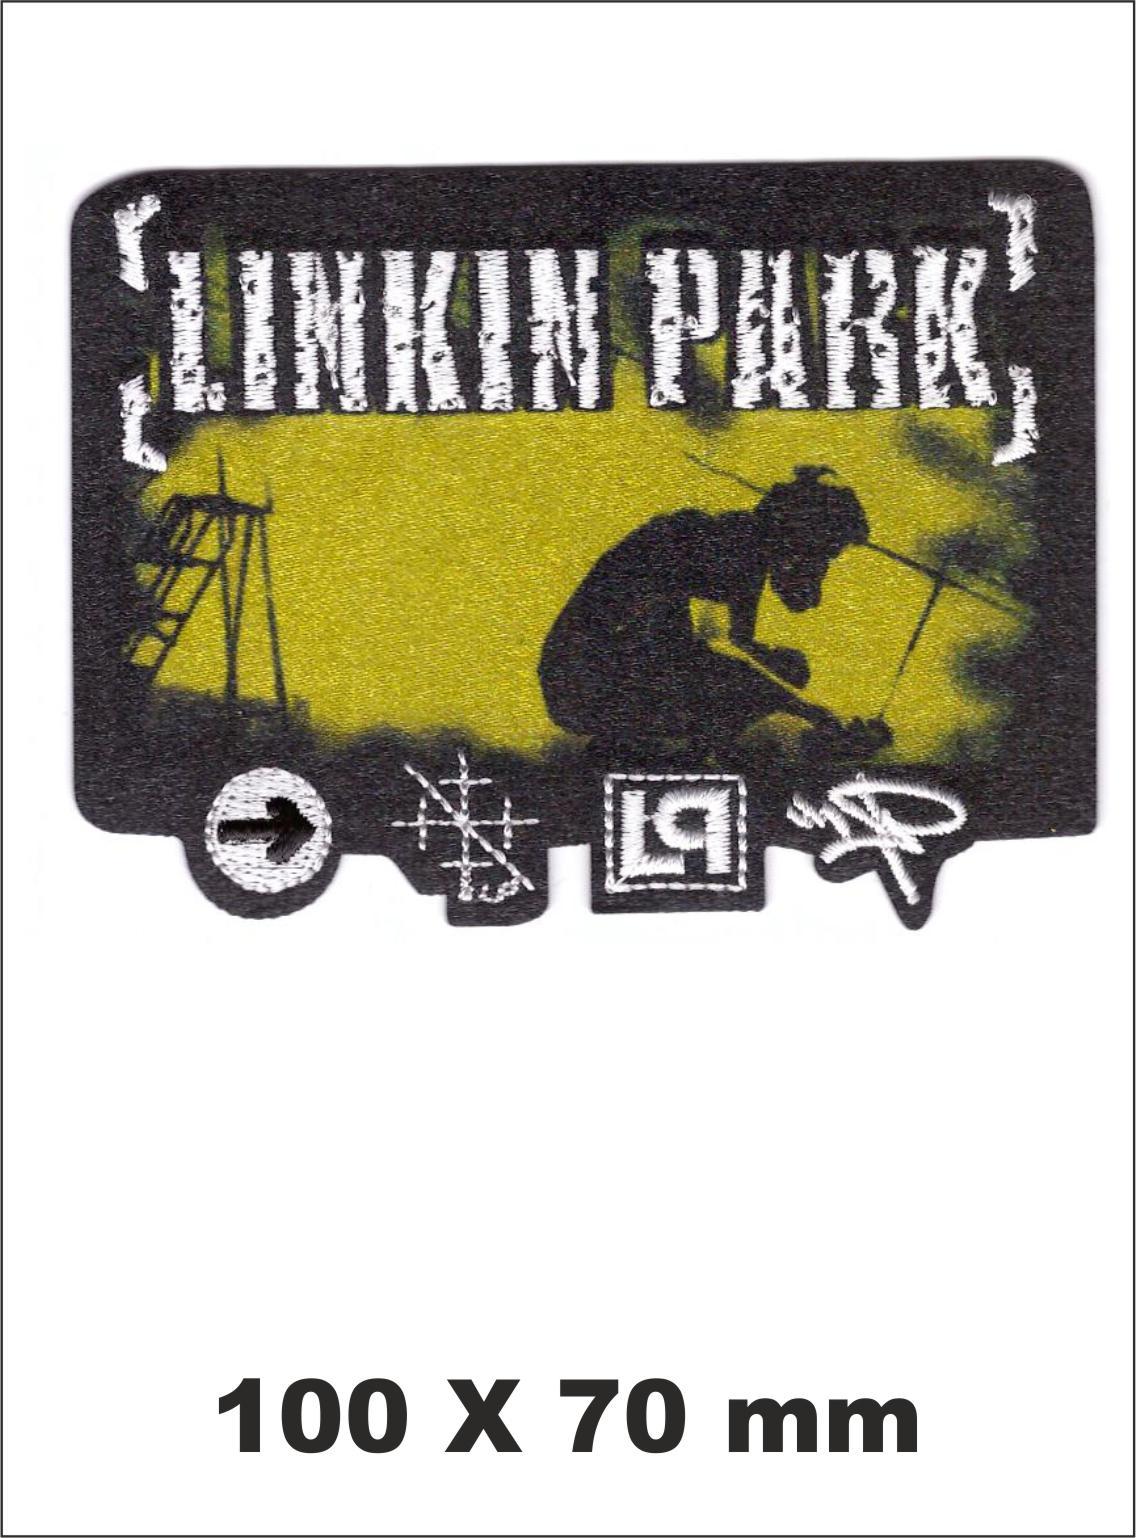 PARCHE BORDADO LINKIN PARK